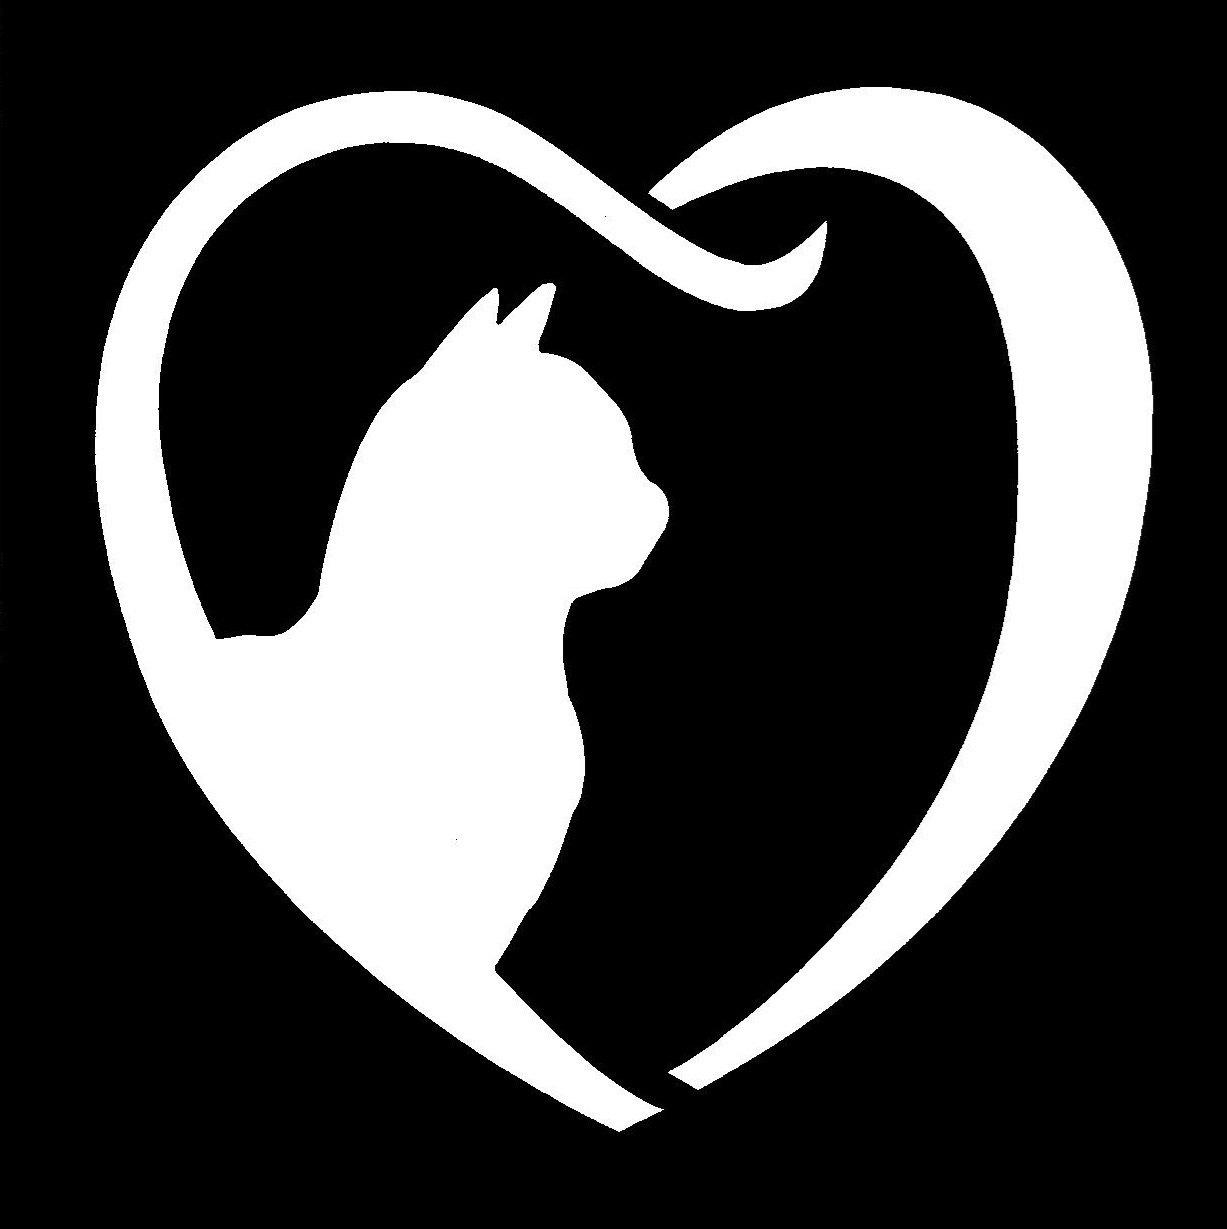 Cat Heart Sparkle Stencil 1pc Hokey Pokey Shop